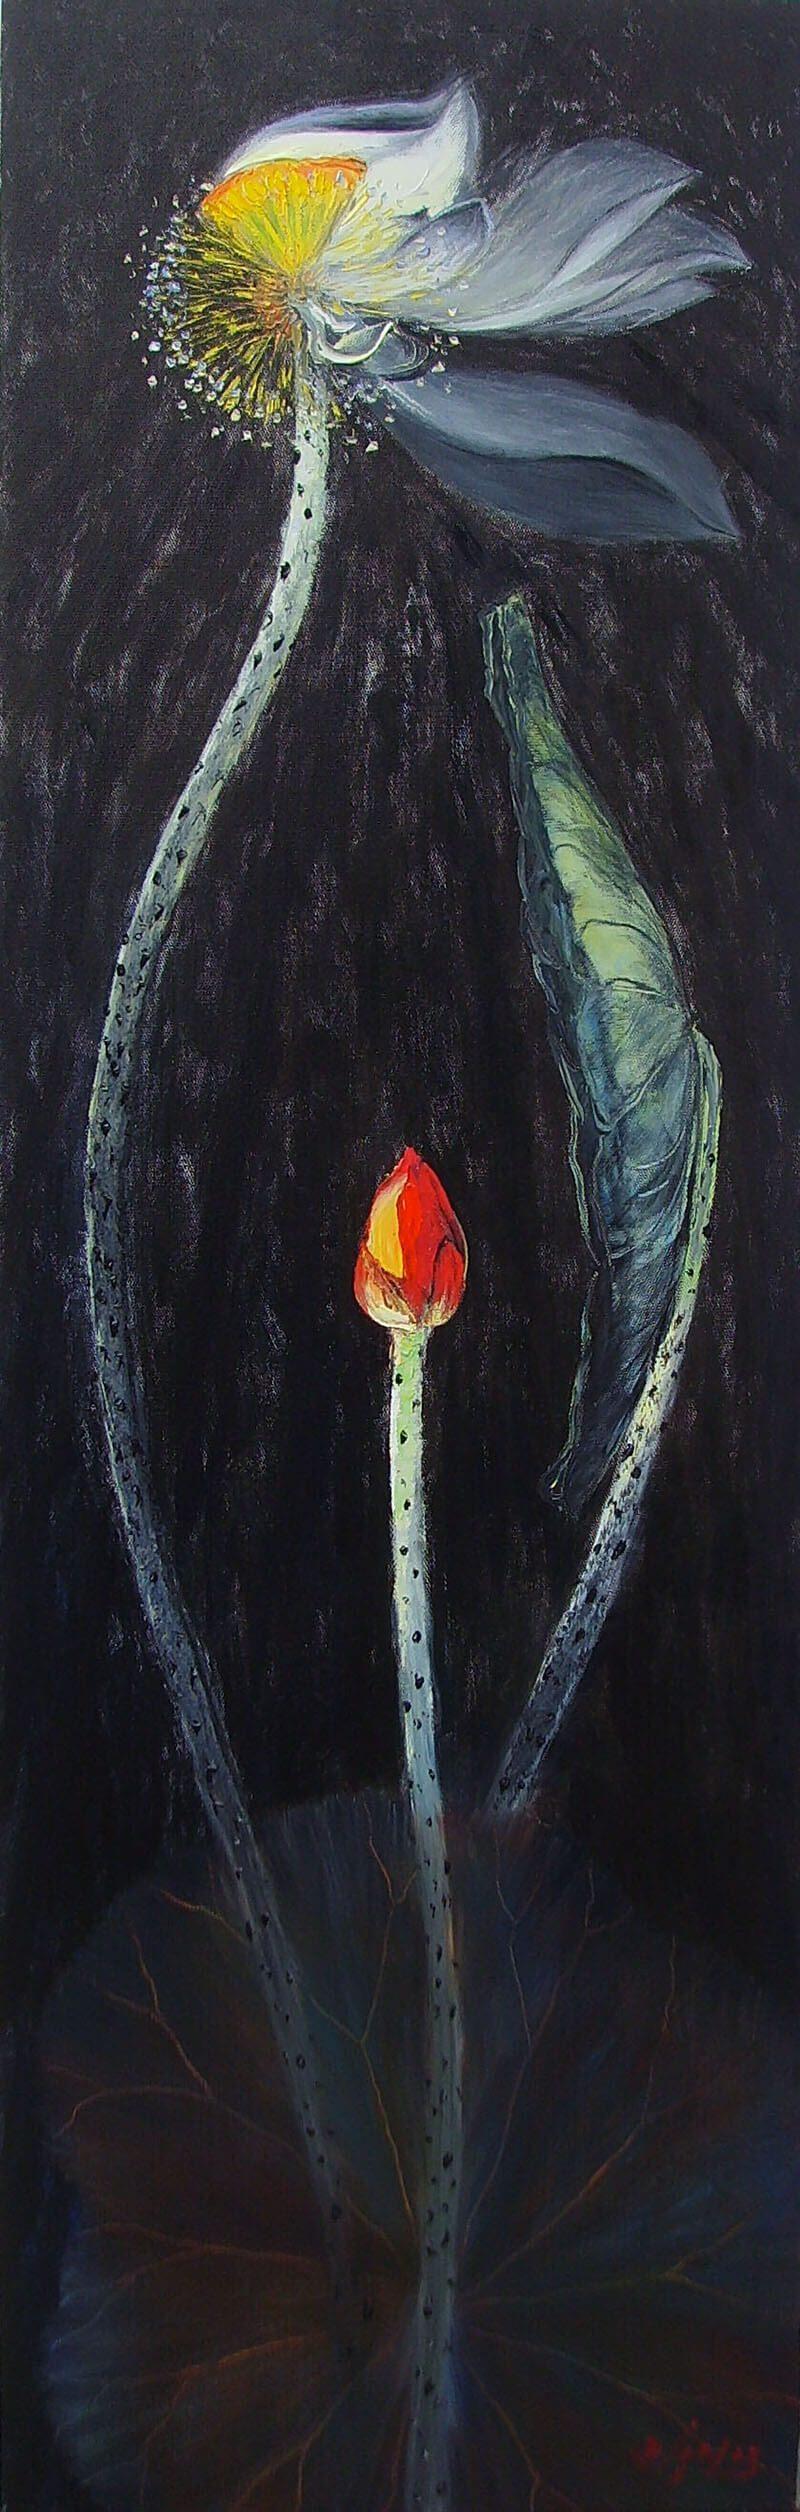 Lotus IV - Oil Paintings Flower by Artist Dang Dinh Ngo